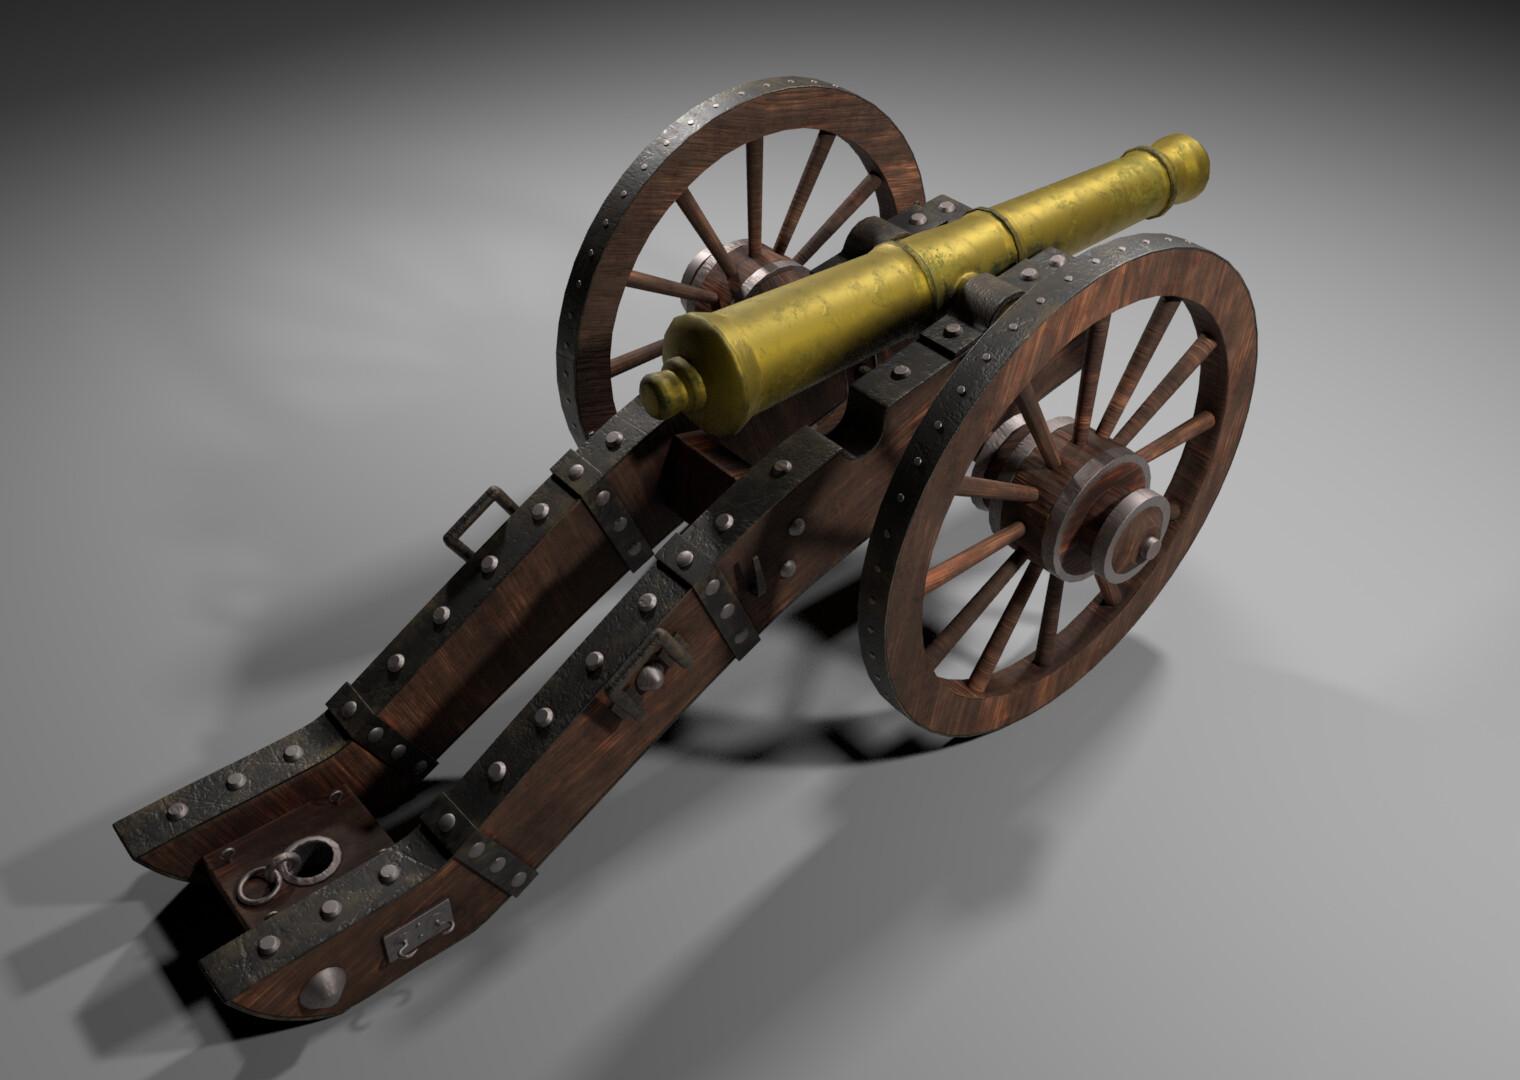 Edward konovalov cannon 4